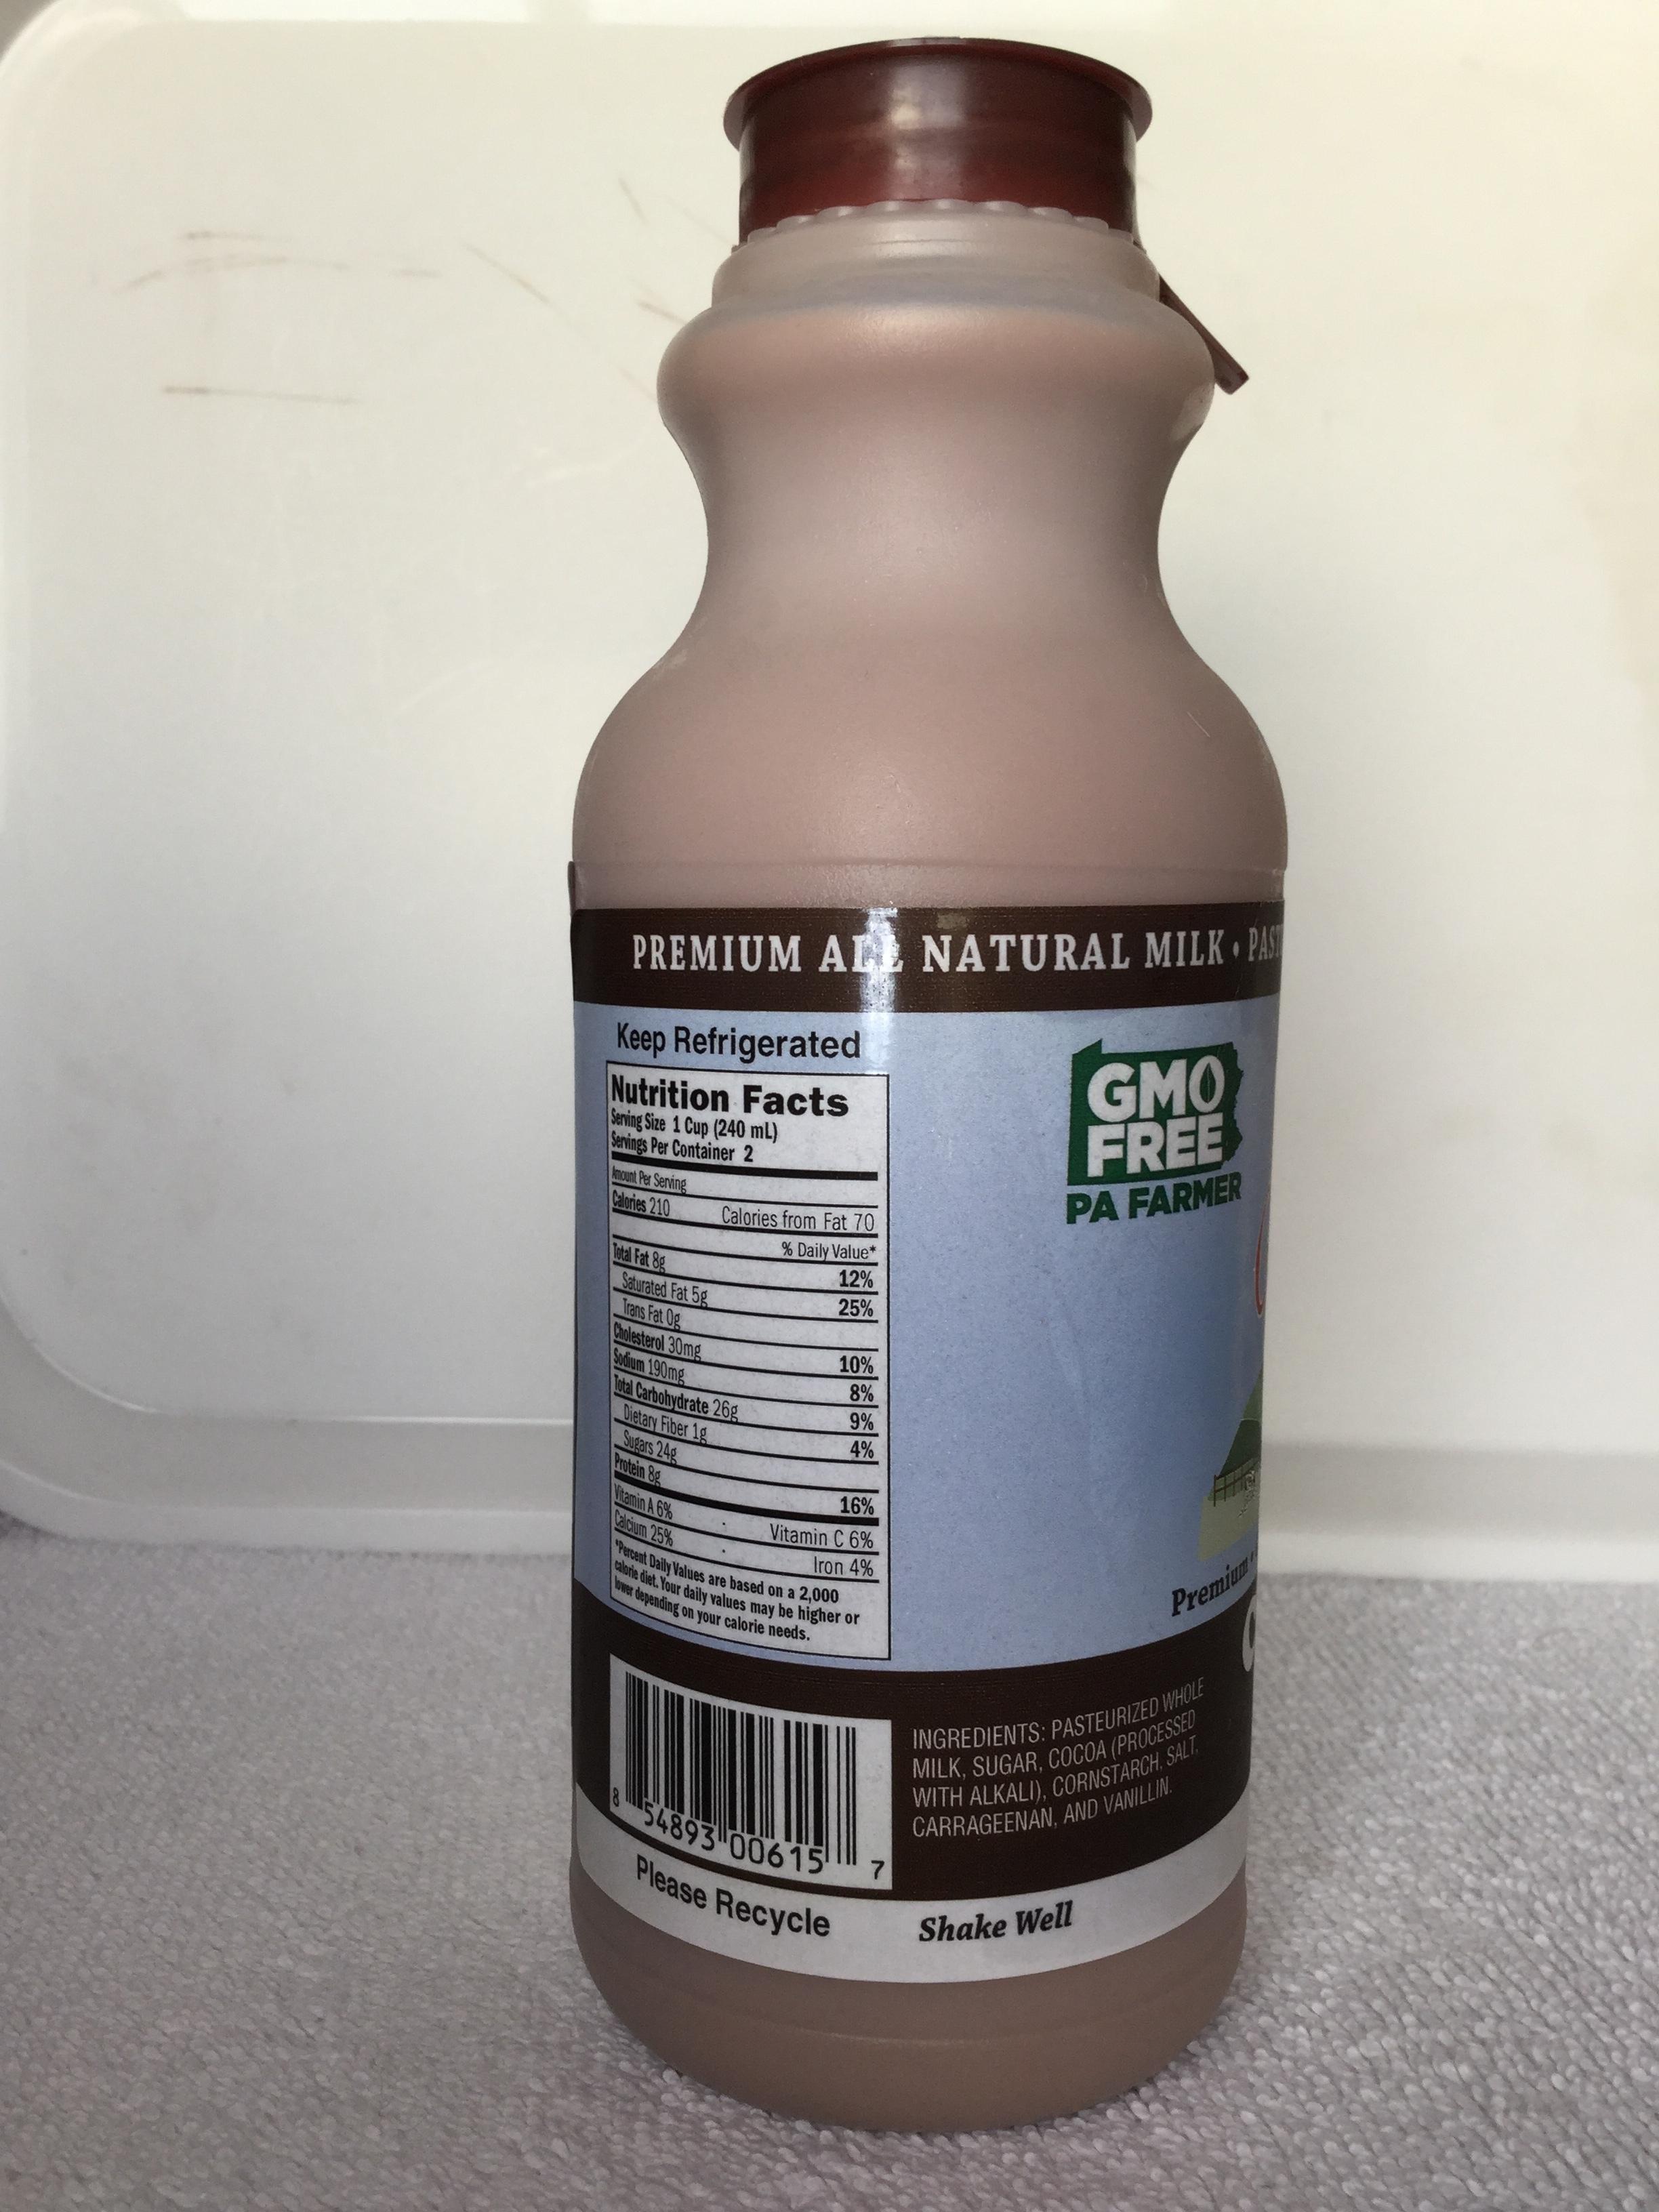 Apple Valley Chocolate Milk